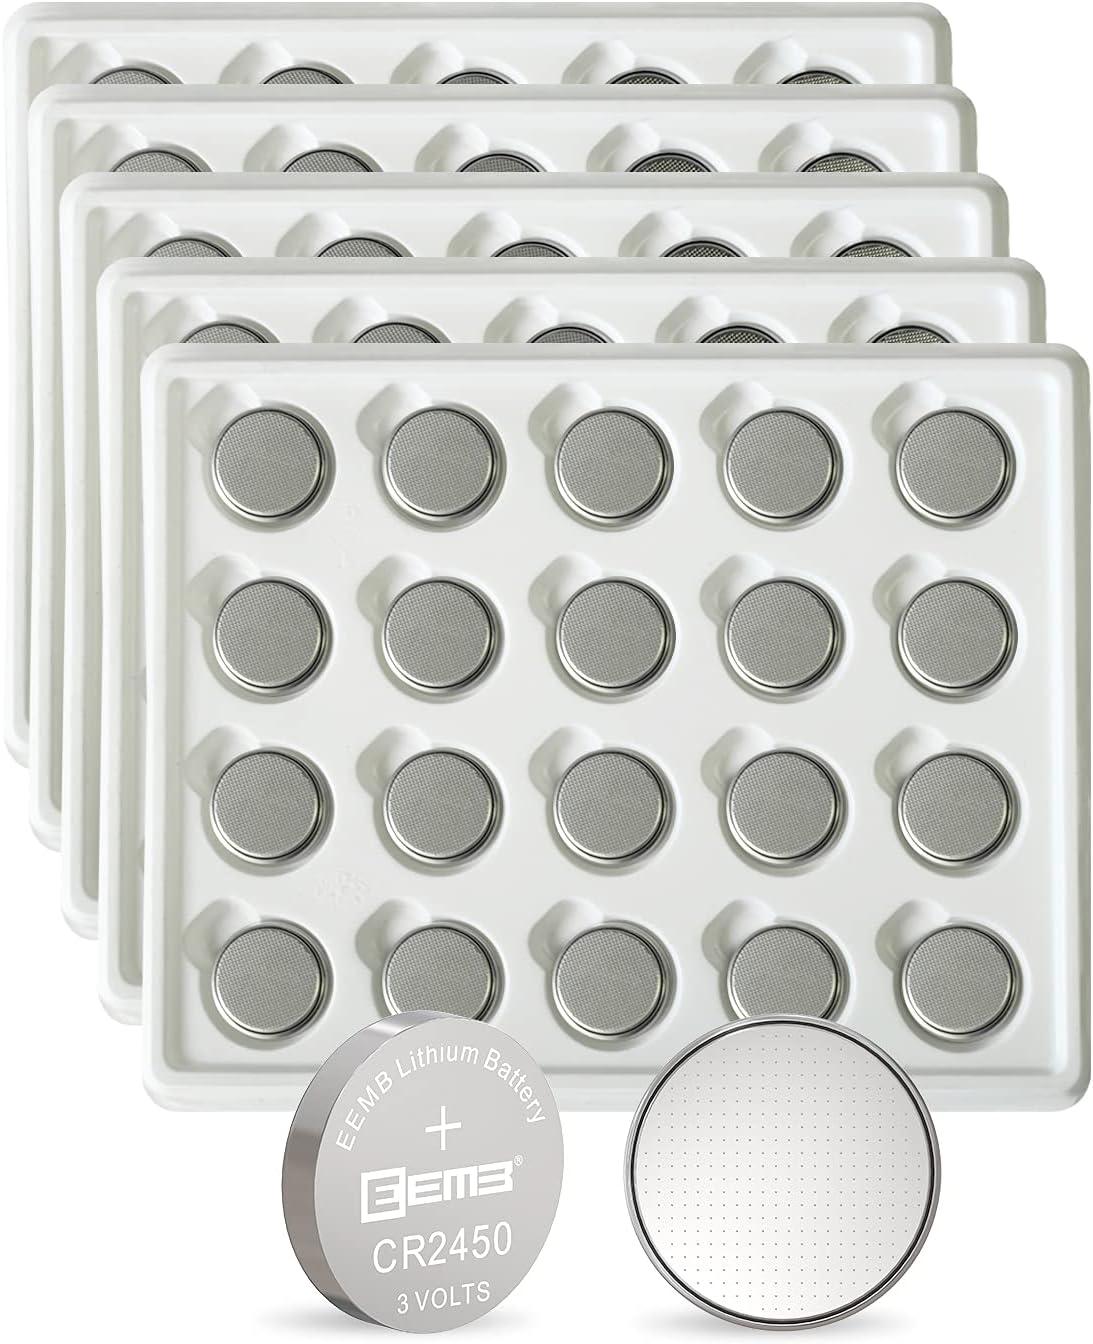 100PCS EEMB CR2450 Battery 3V Coin Cell 2450 Boston Mall Bat Lithium unisex